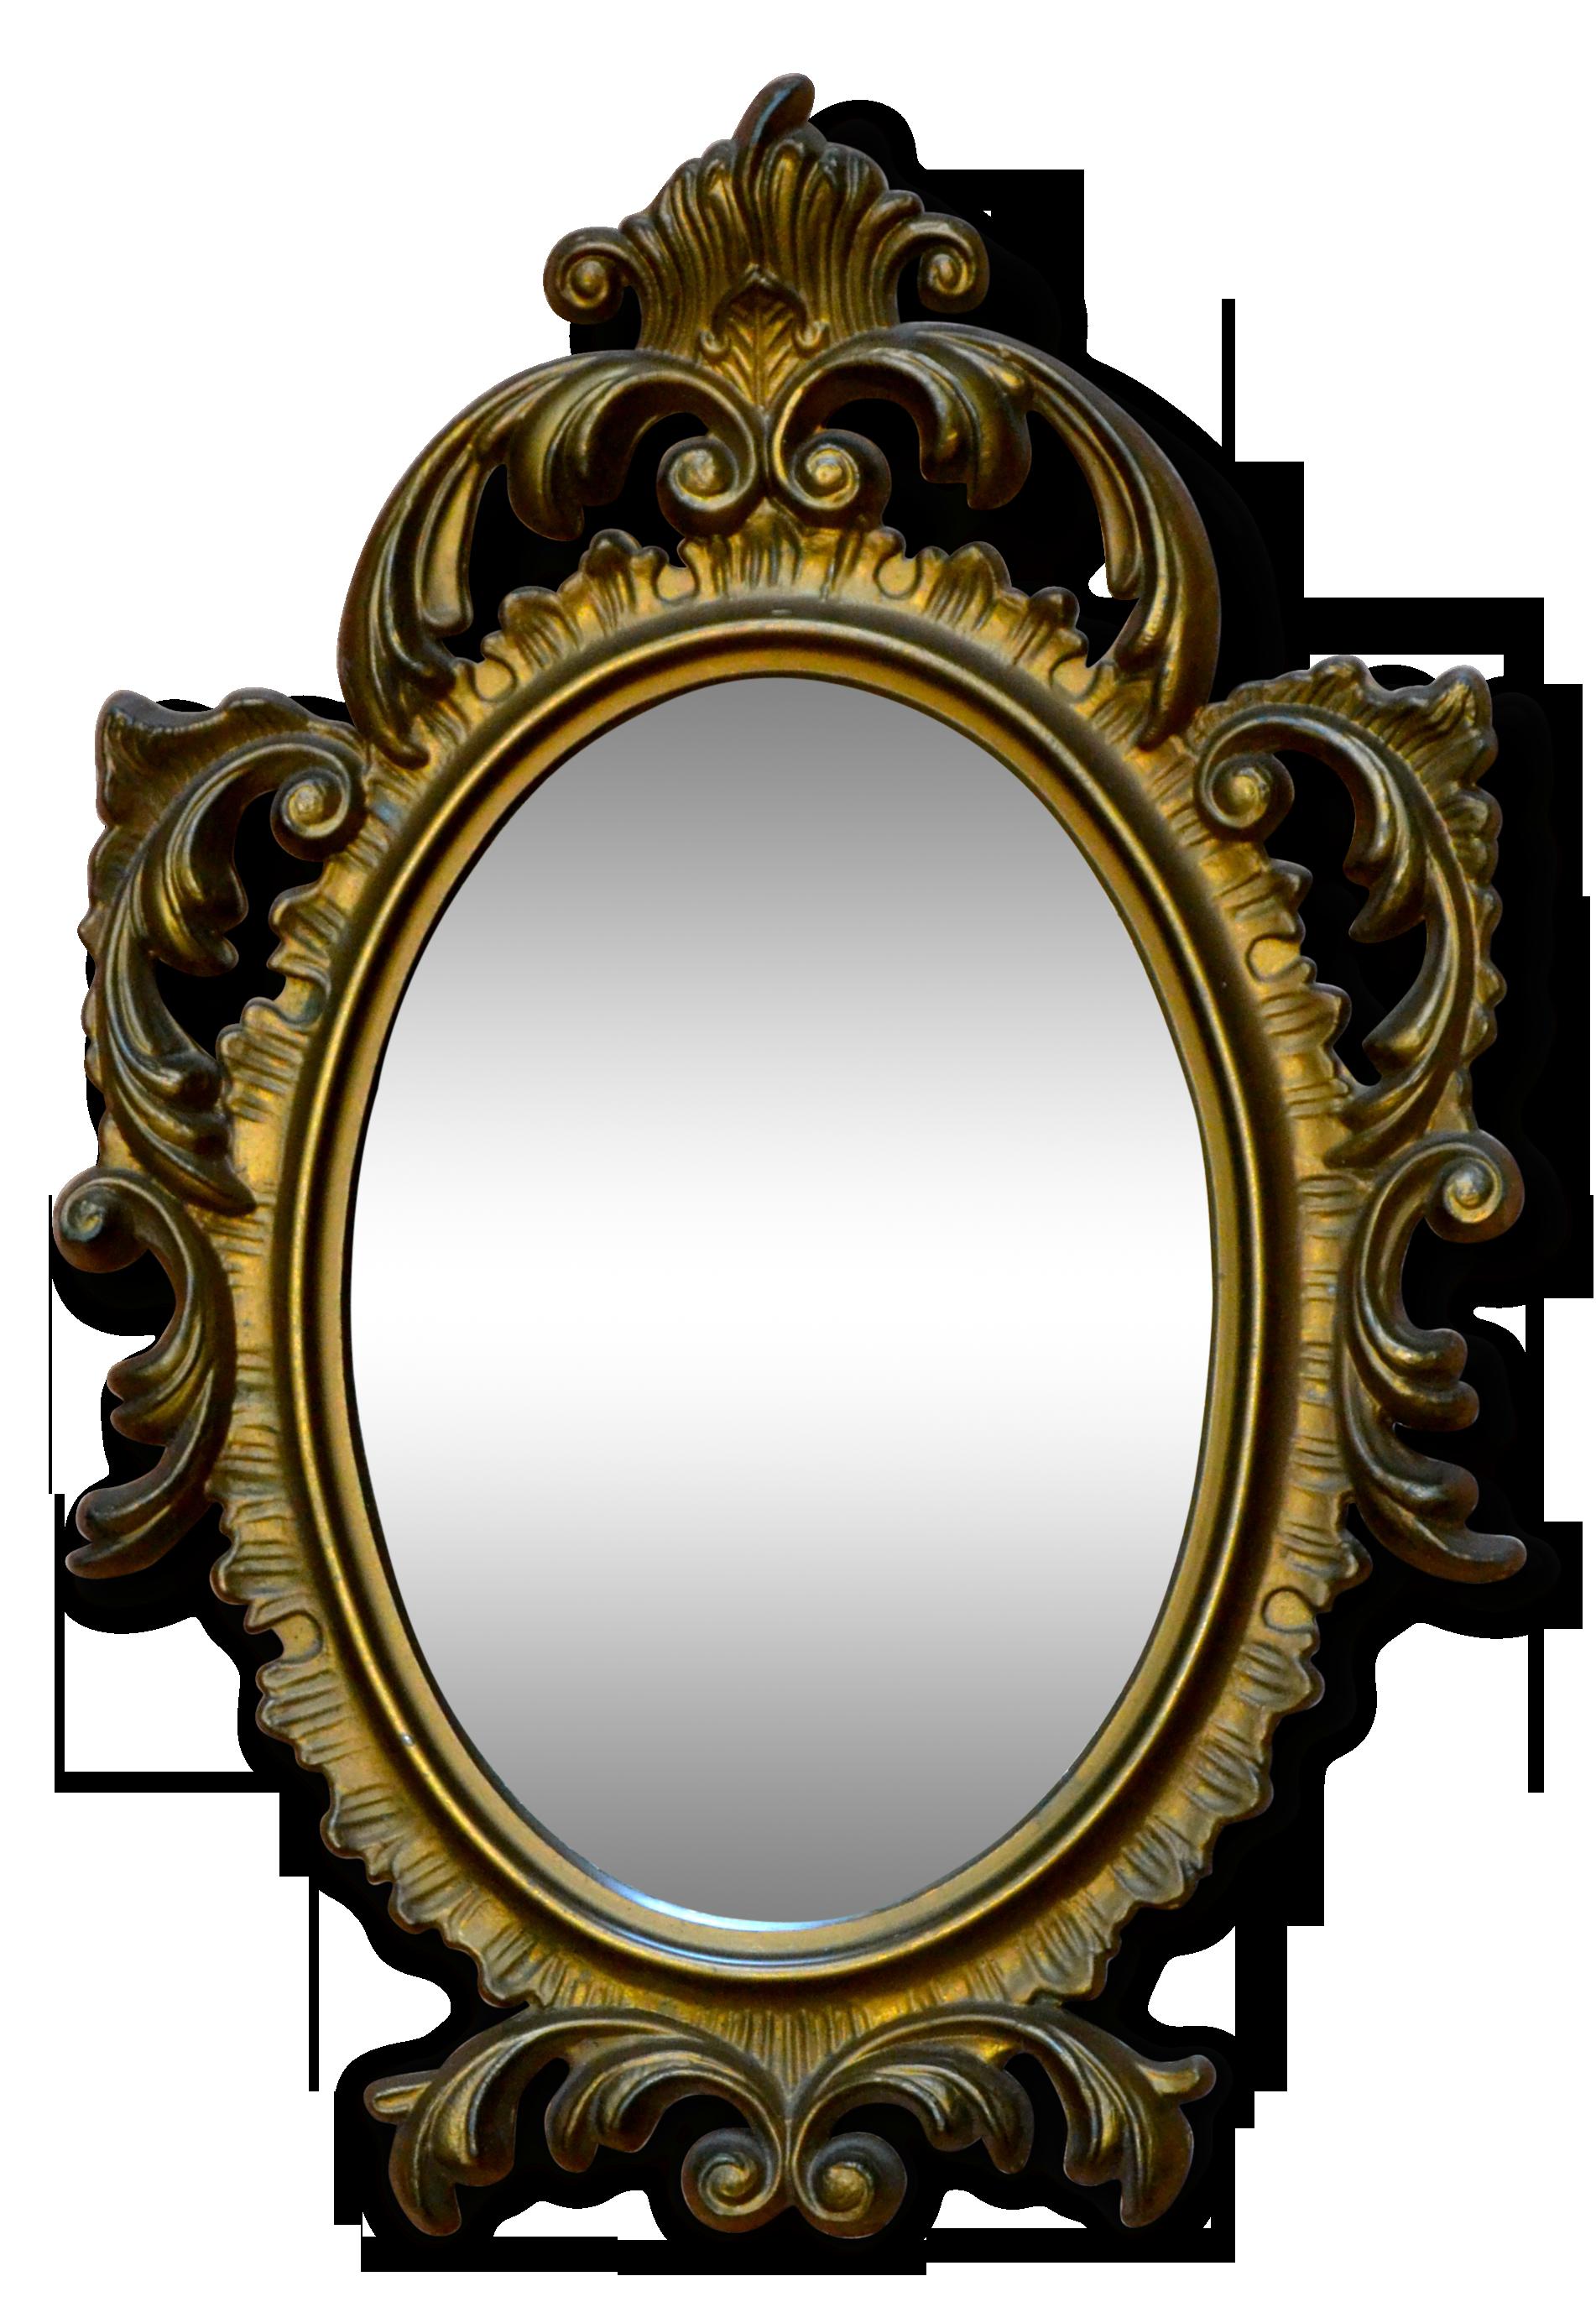 Miroir Mural Baroque Miroir Or Soleil Miroir Flammes miroir cheminée miroir ancien